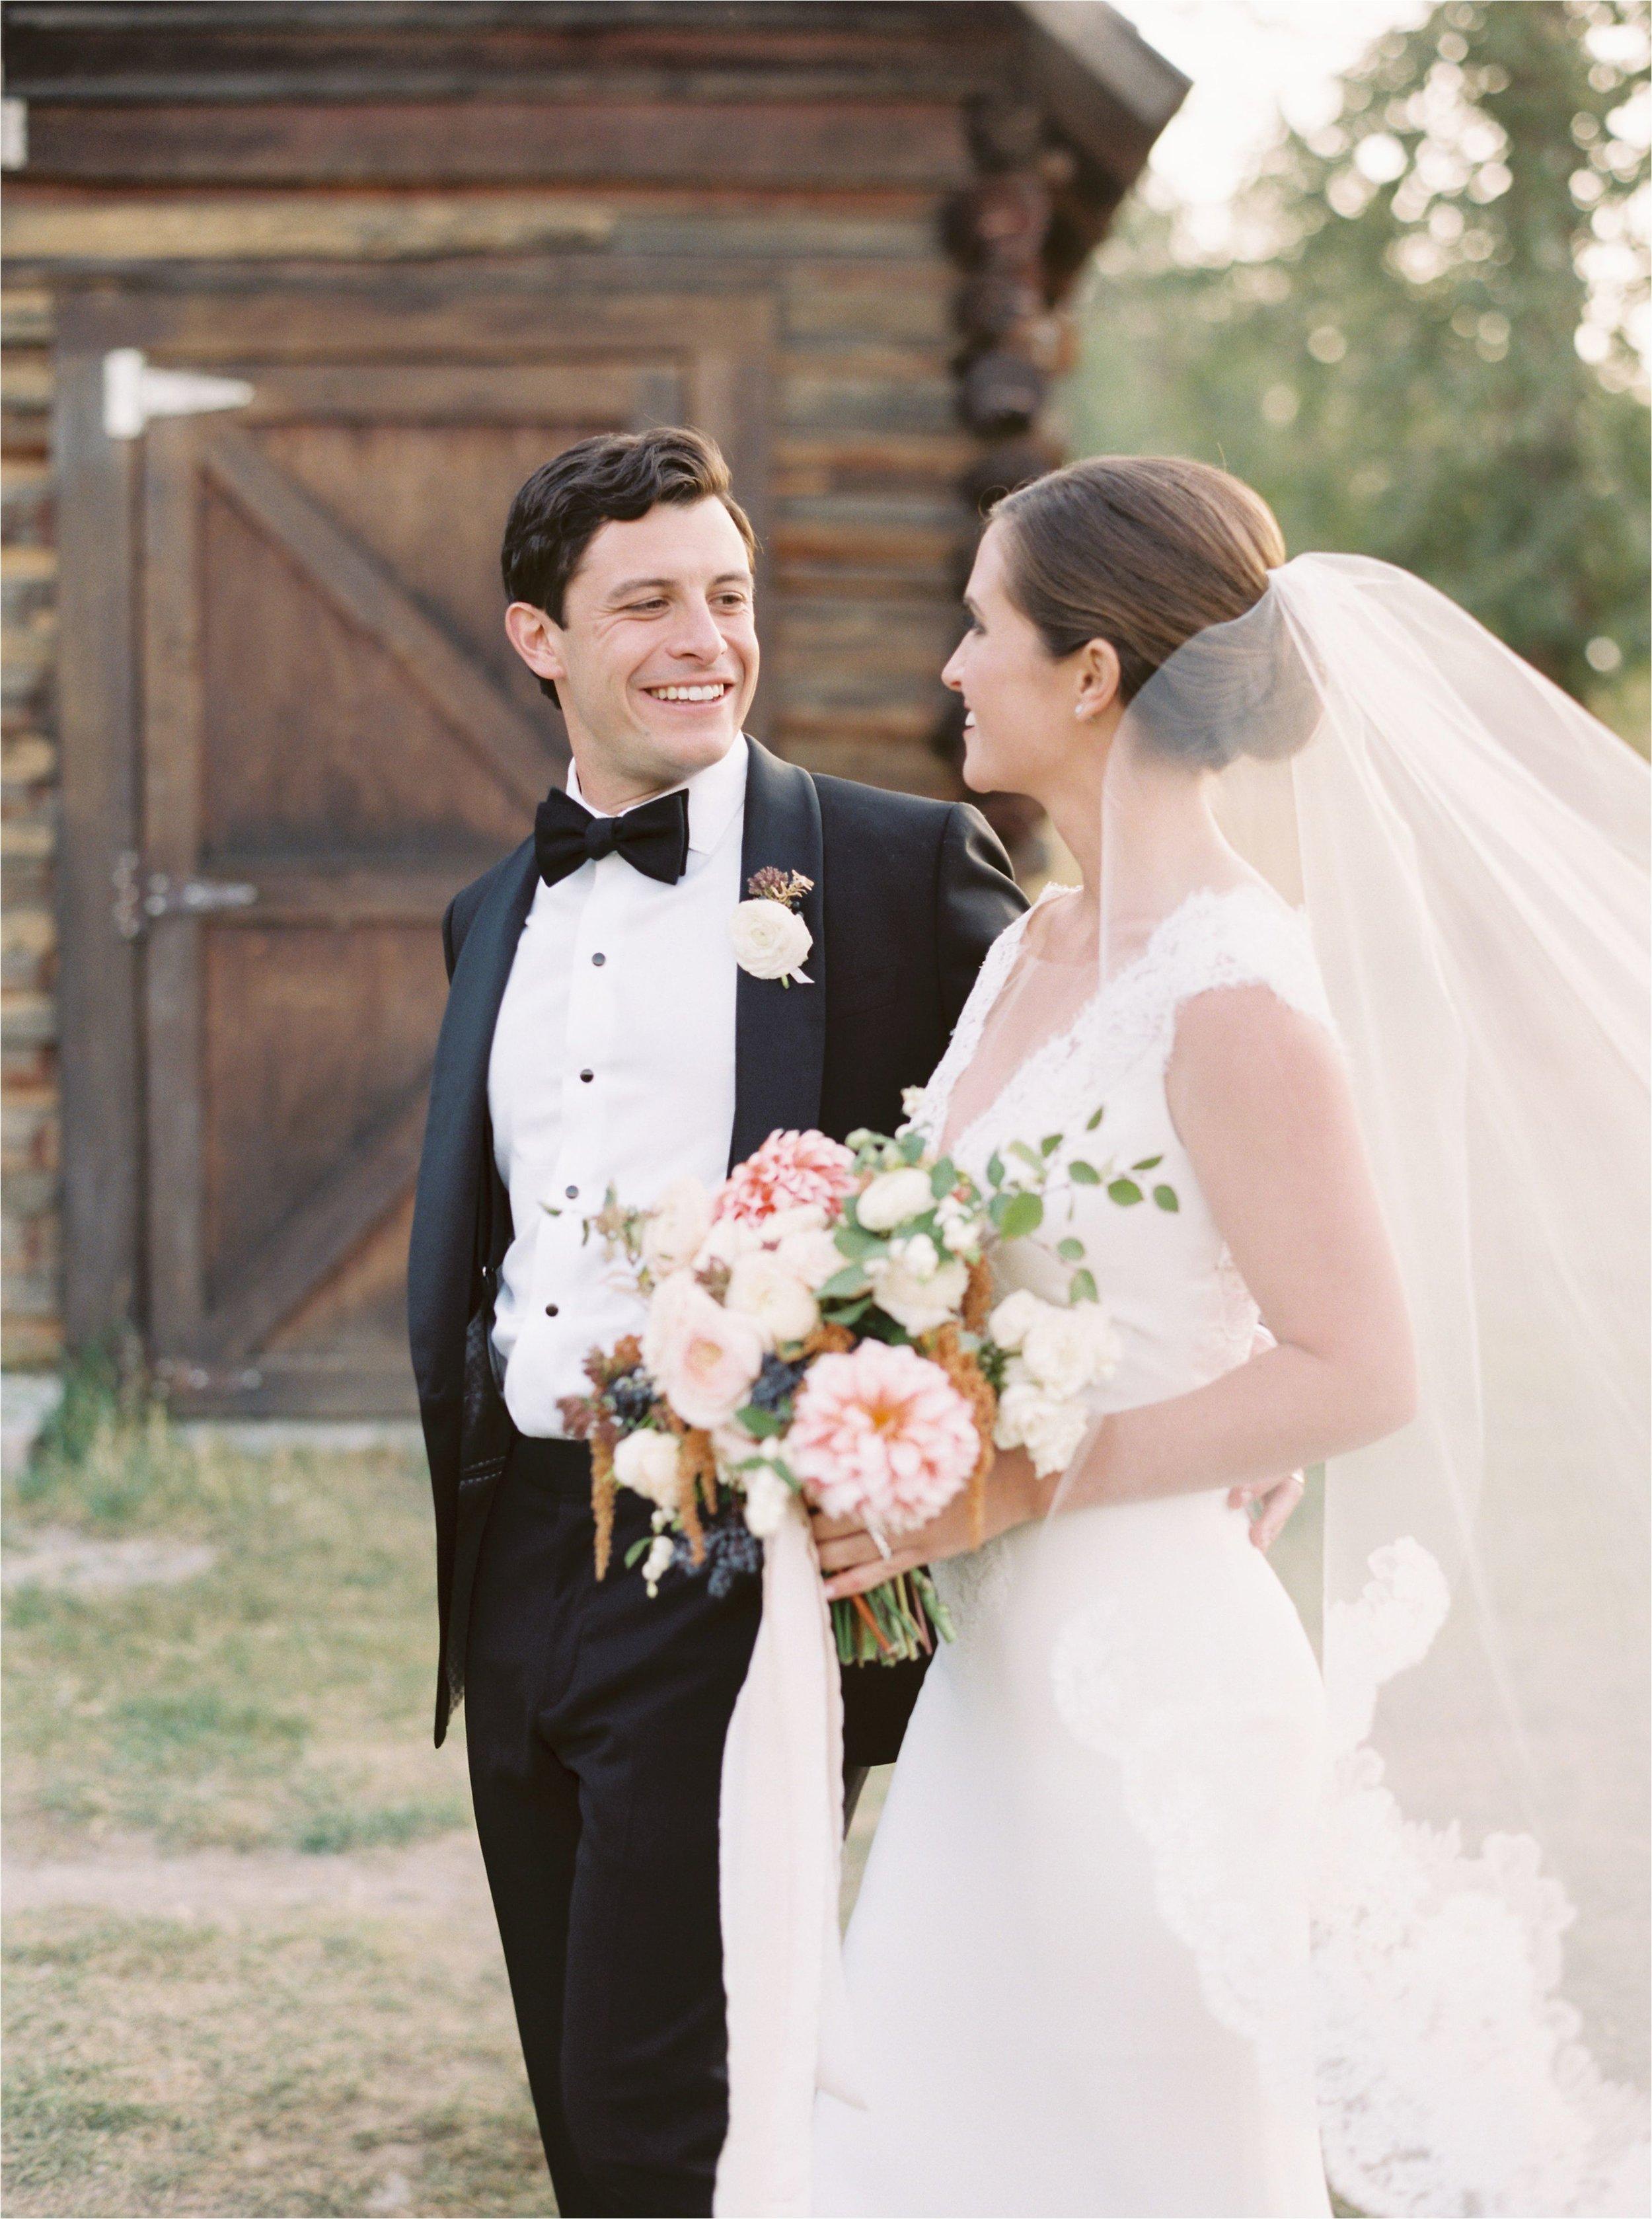 Jeremiah & Rachel Photographywww.jeremiahandrachel.comGreenwood Eventswww.greenwood.events